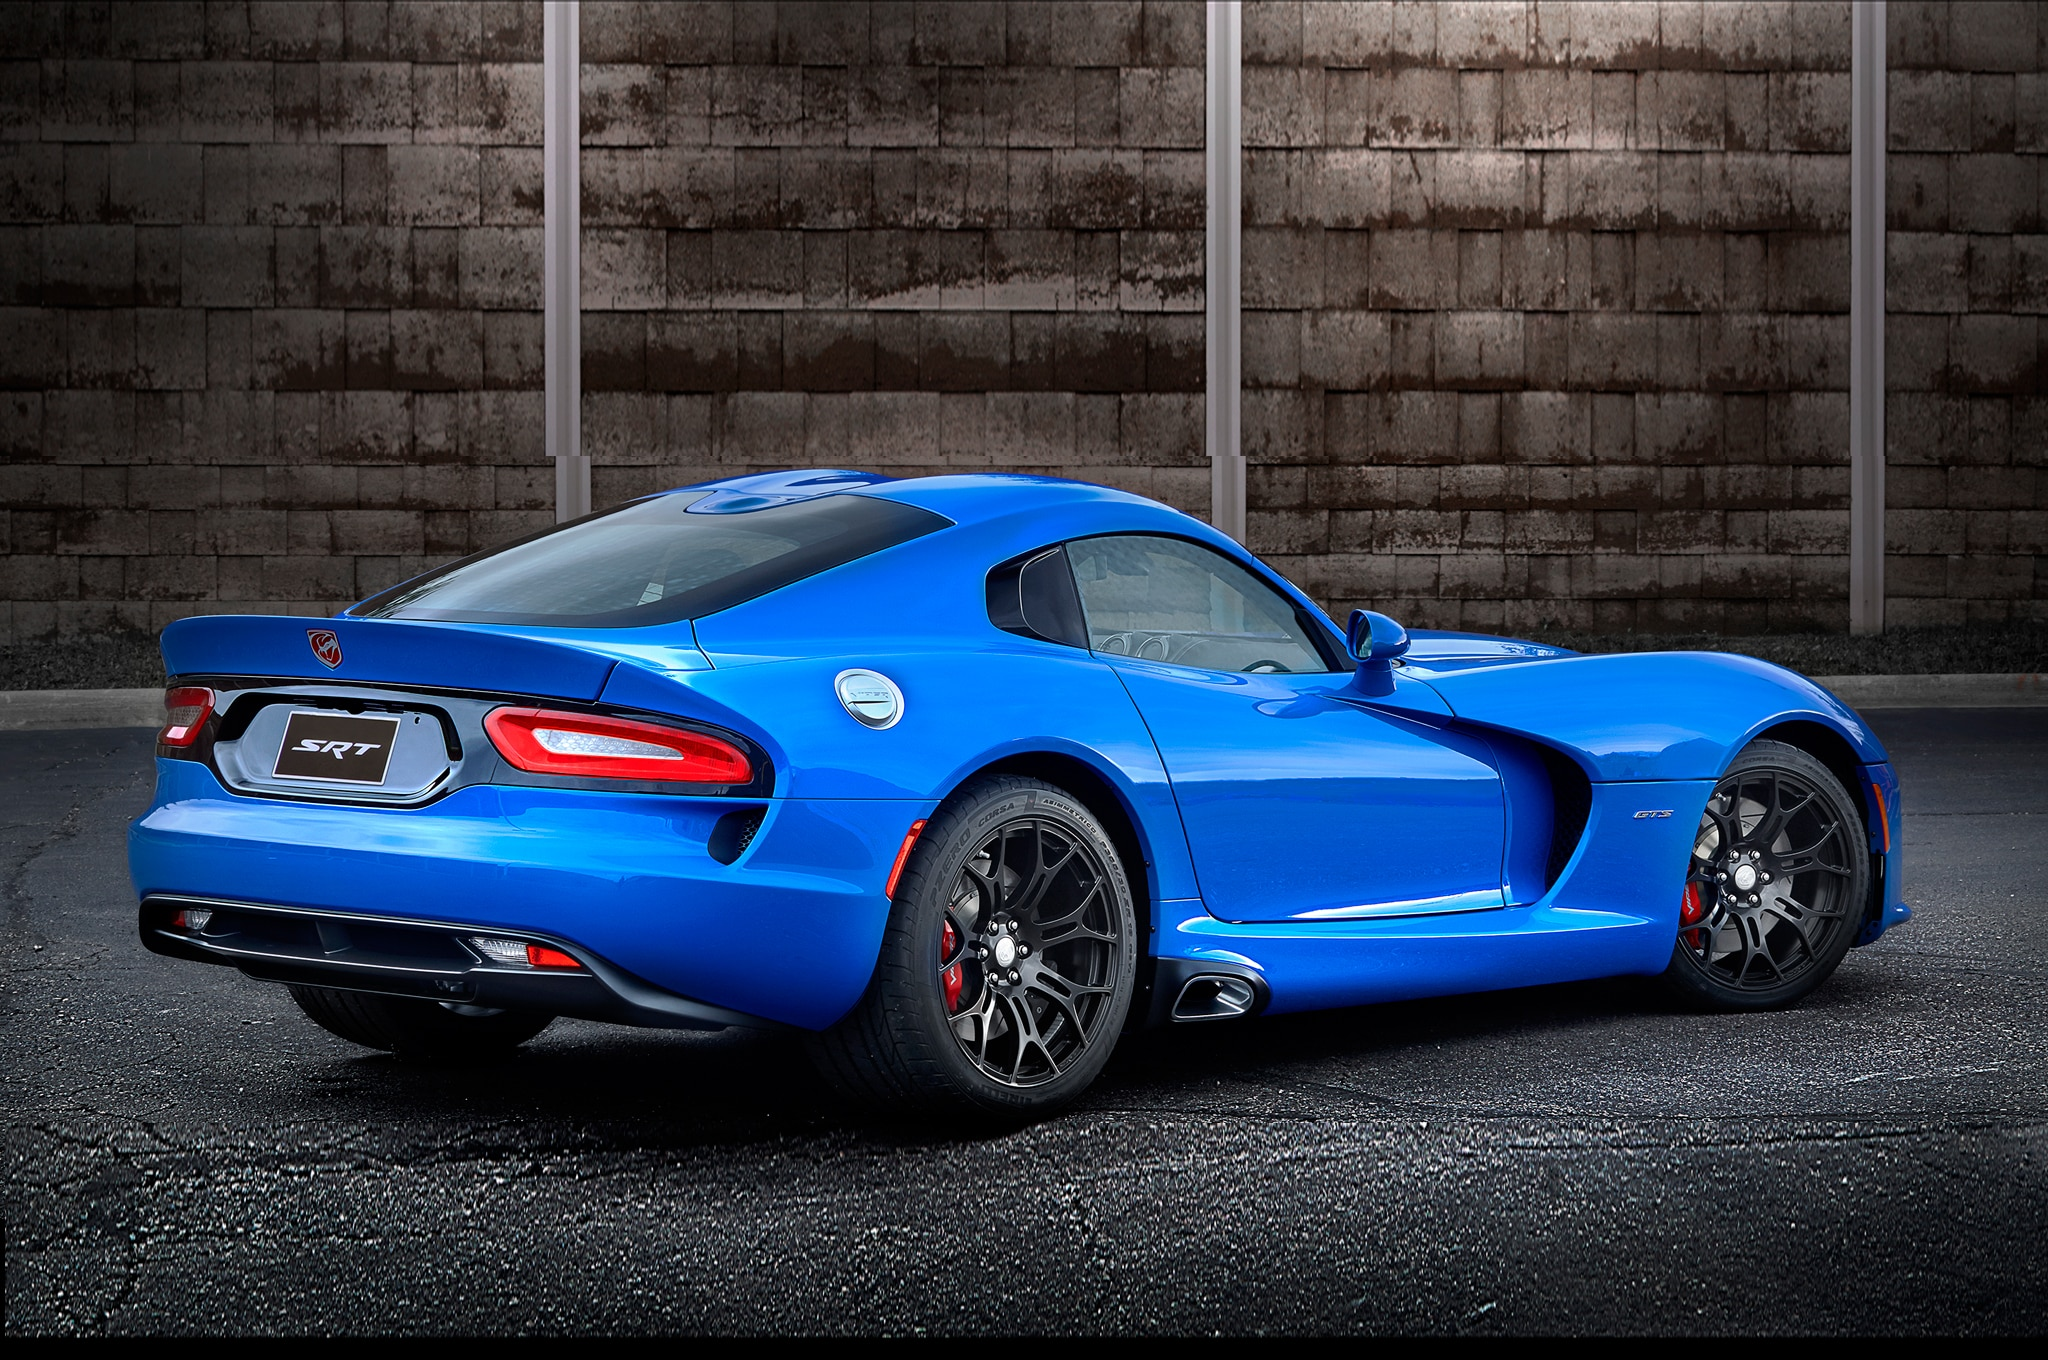 marvelous viper 5904v. Chrysler September 2014 Sales Surge 19 Percent Jeep Leads The Charge 2015  Dodge Viper SRT GTS Best 100 Marvelous mercedes ml350 wiring diagrams